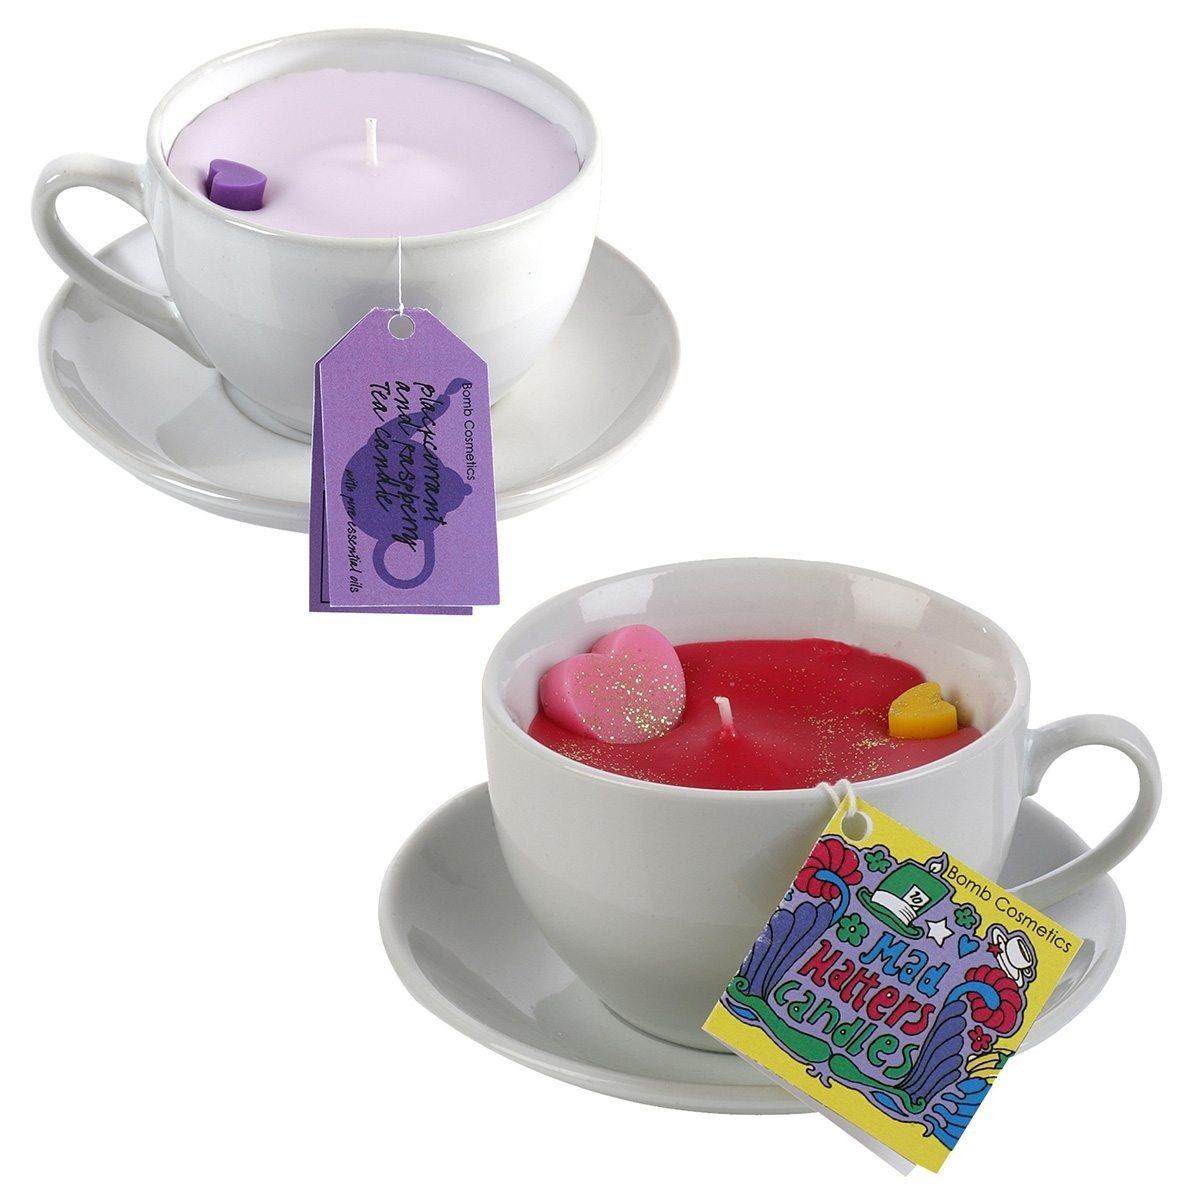 eine tasse tee gef llig duftende kerzen in der tasse. Black Bedroom Furniture Sets. Home Design Ideas